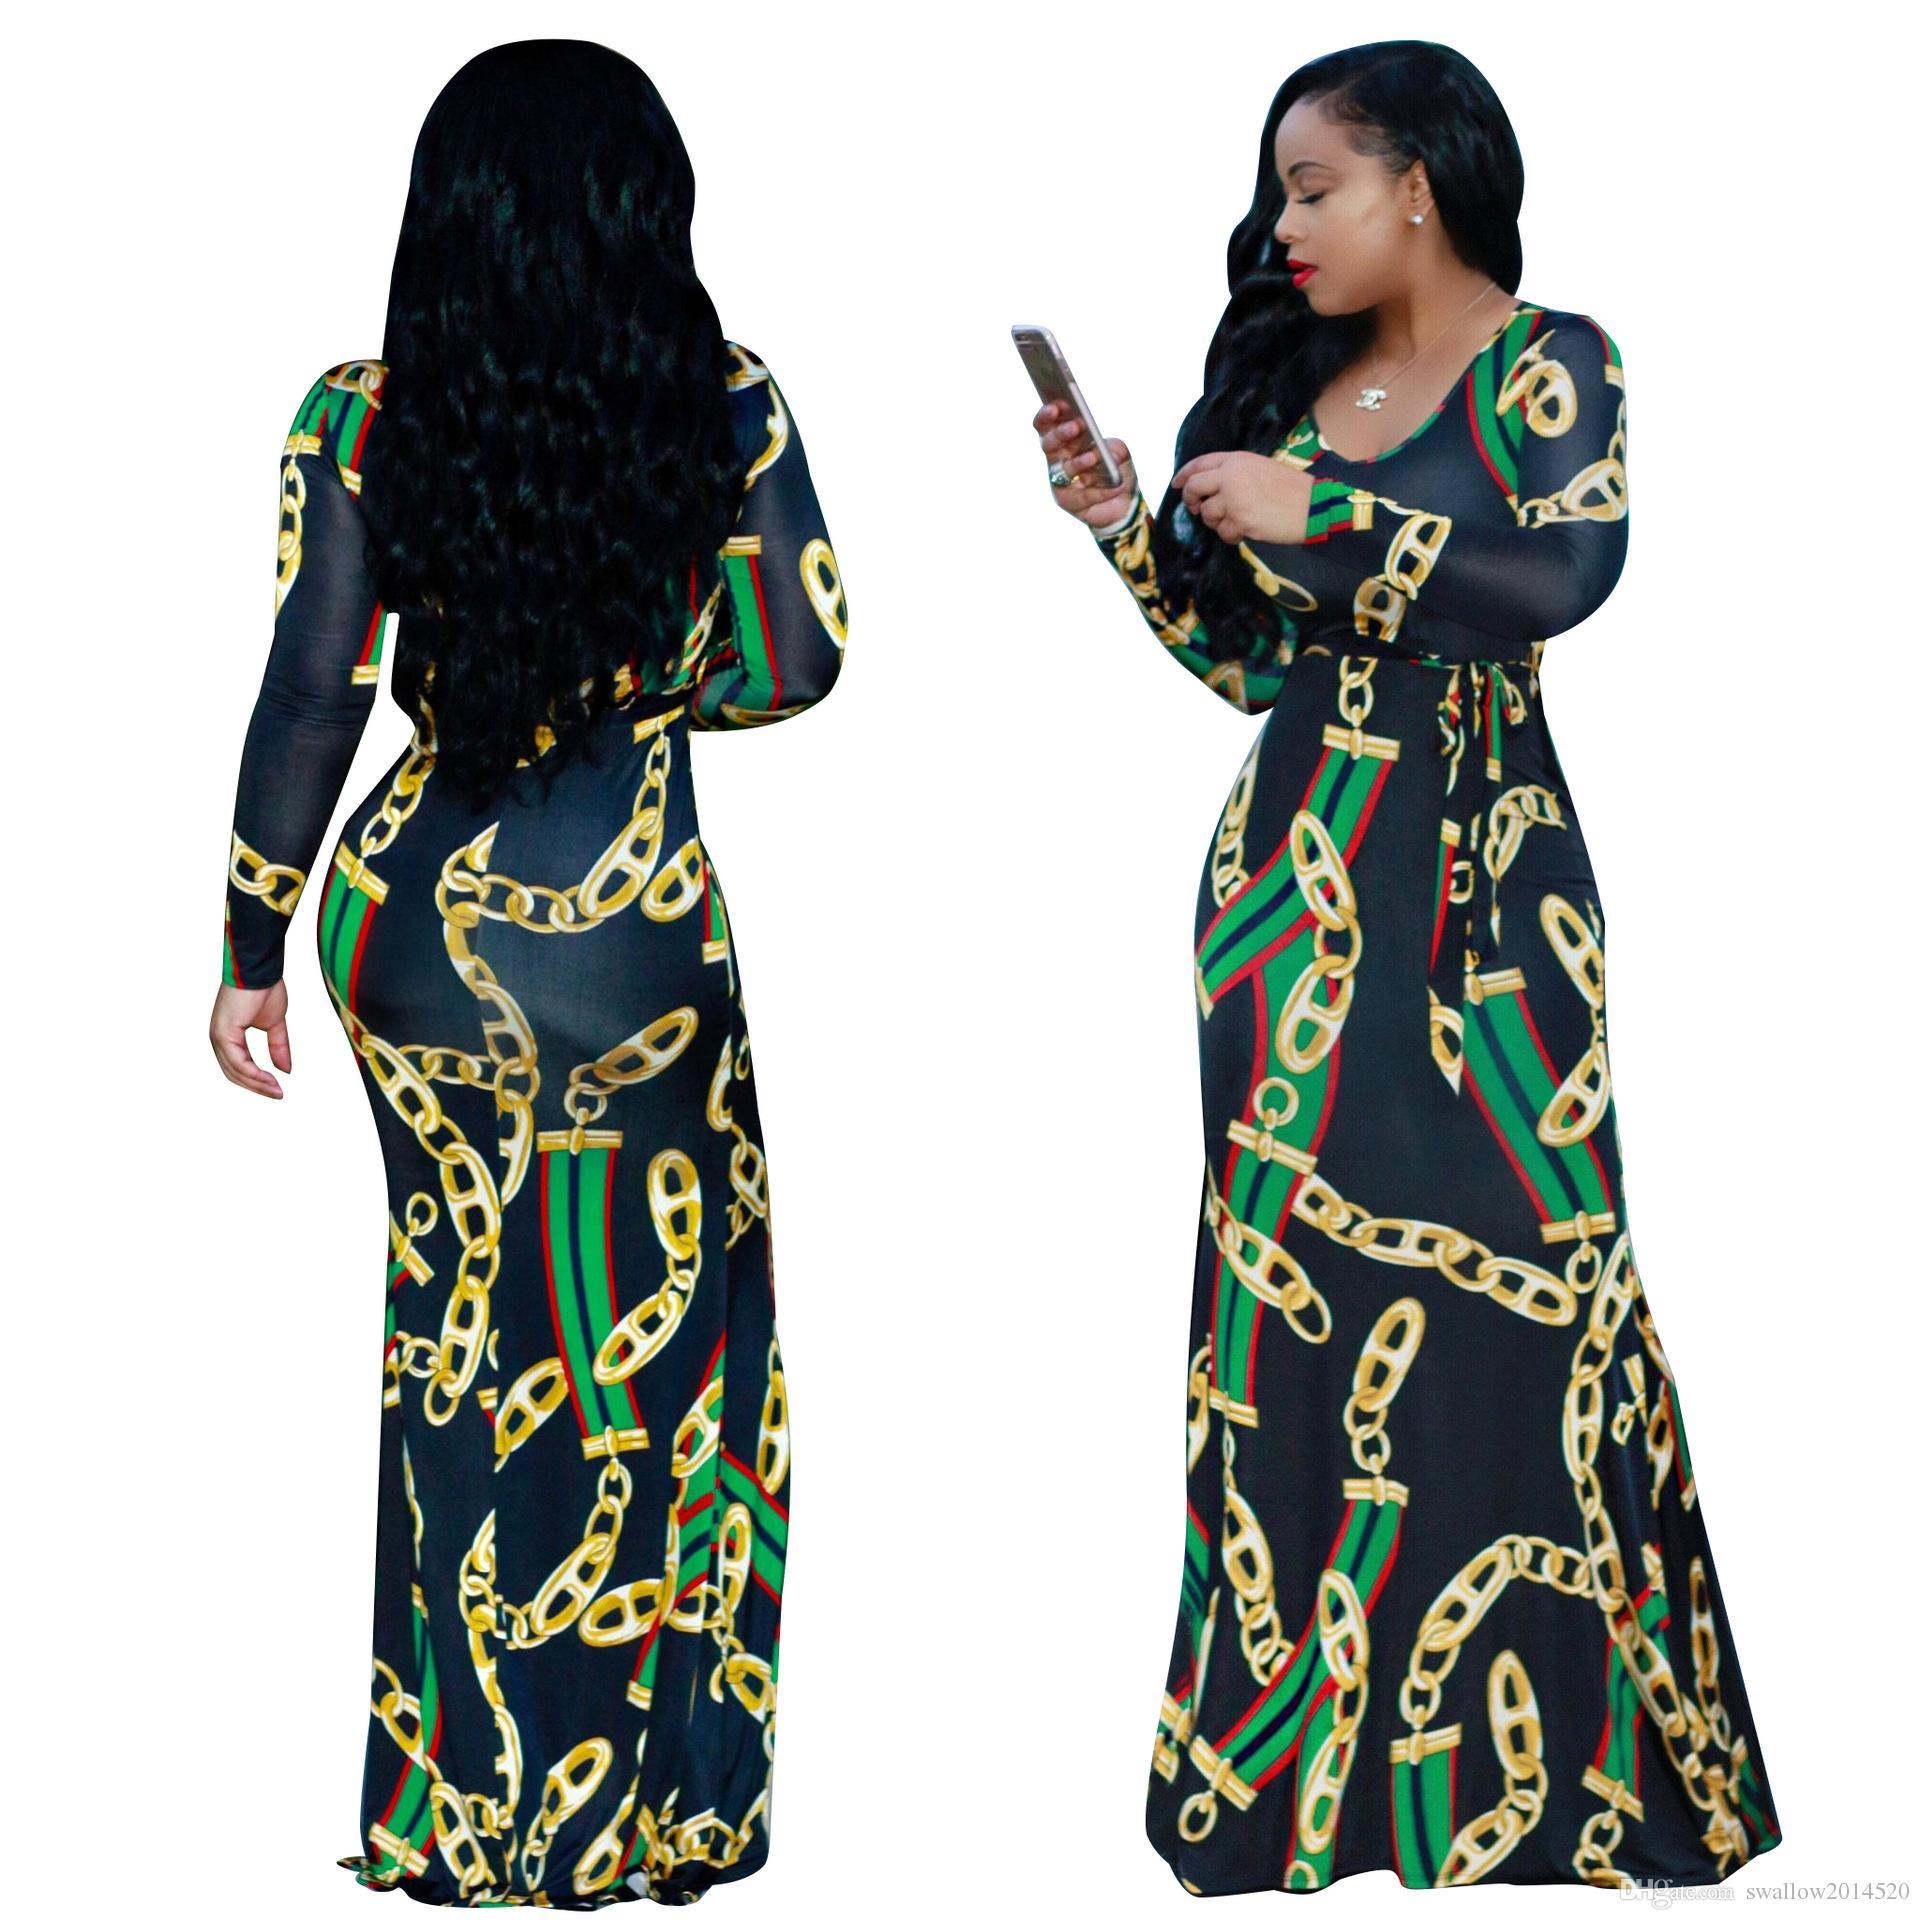 49b69b2ae85ec 2018 Autumn Womens Maxi Dress Traditional African Print Long Dress Dashiki  Elastic Elegant Ladies Bodycon Vintage Chain Printed Plus Size Party Dress  White ...